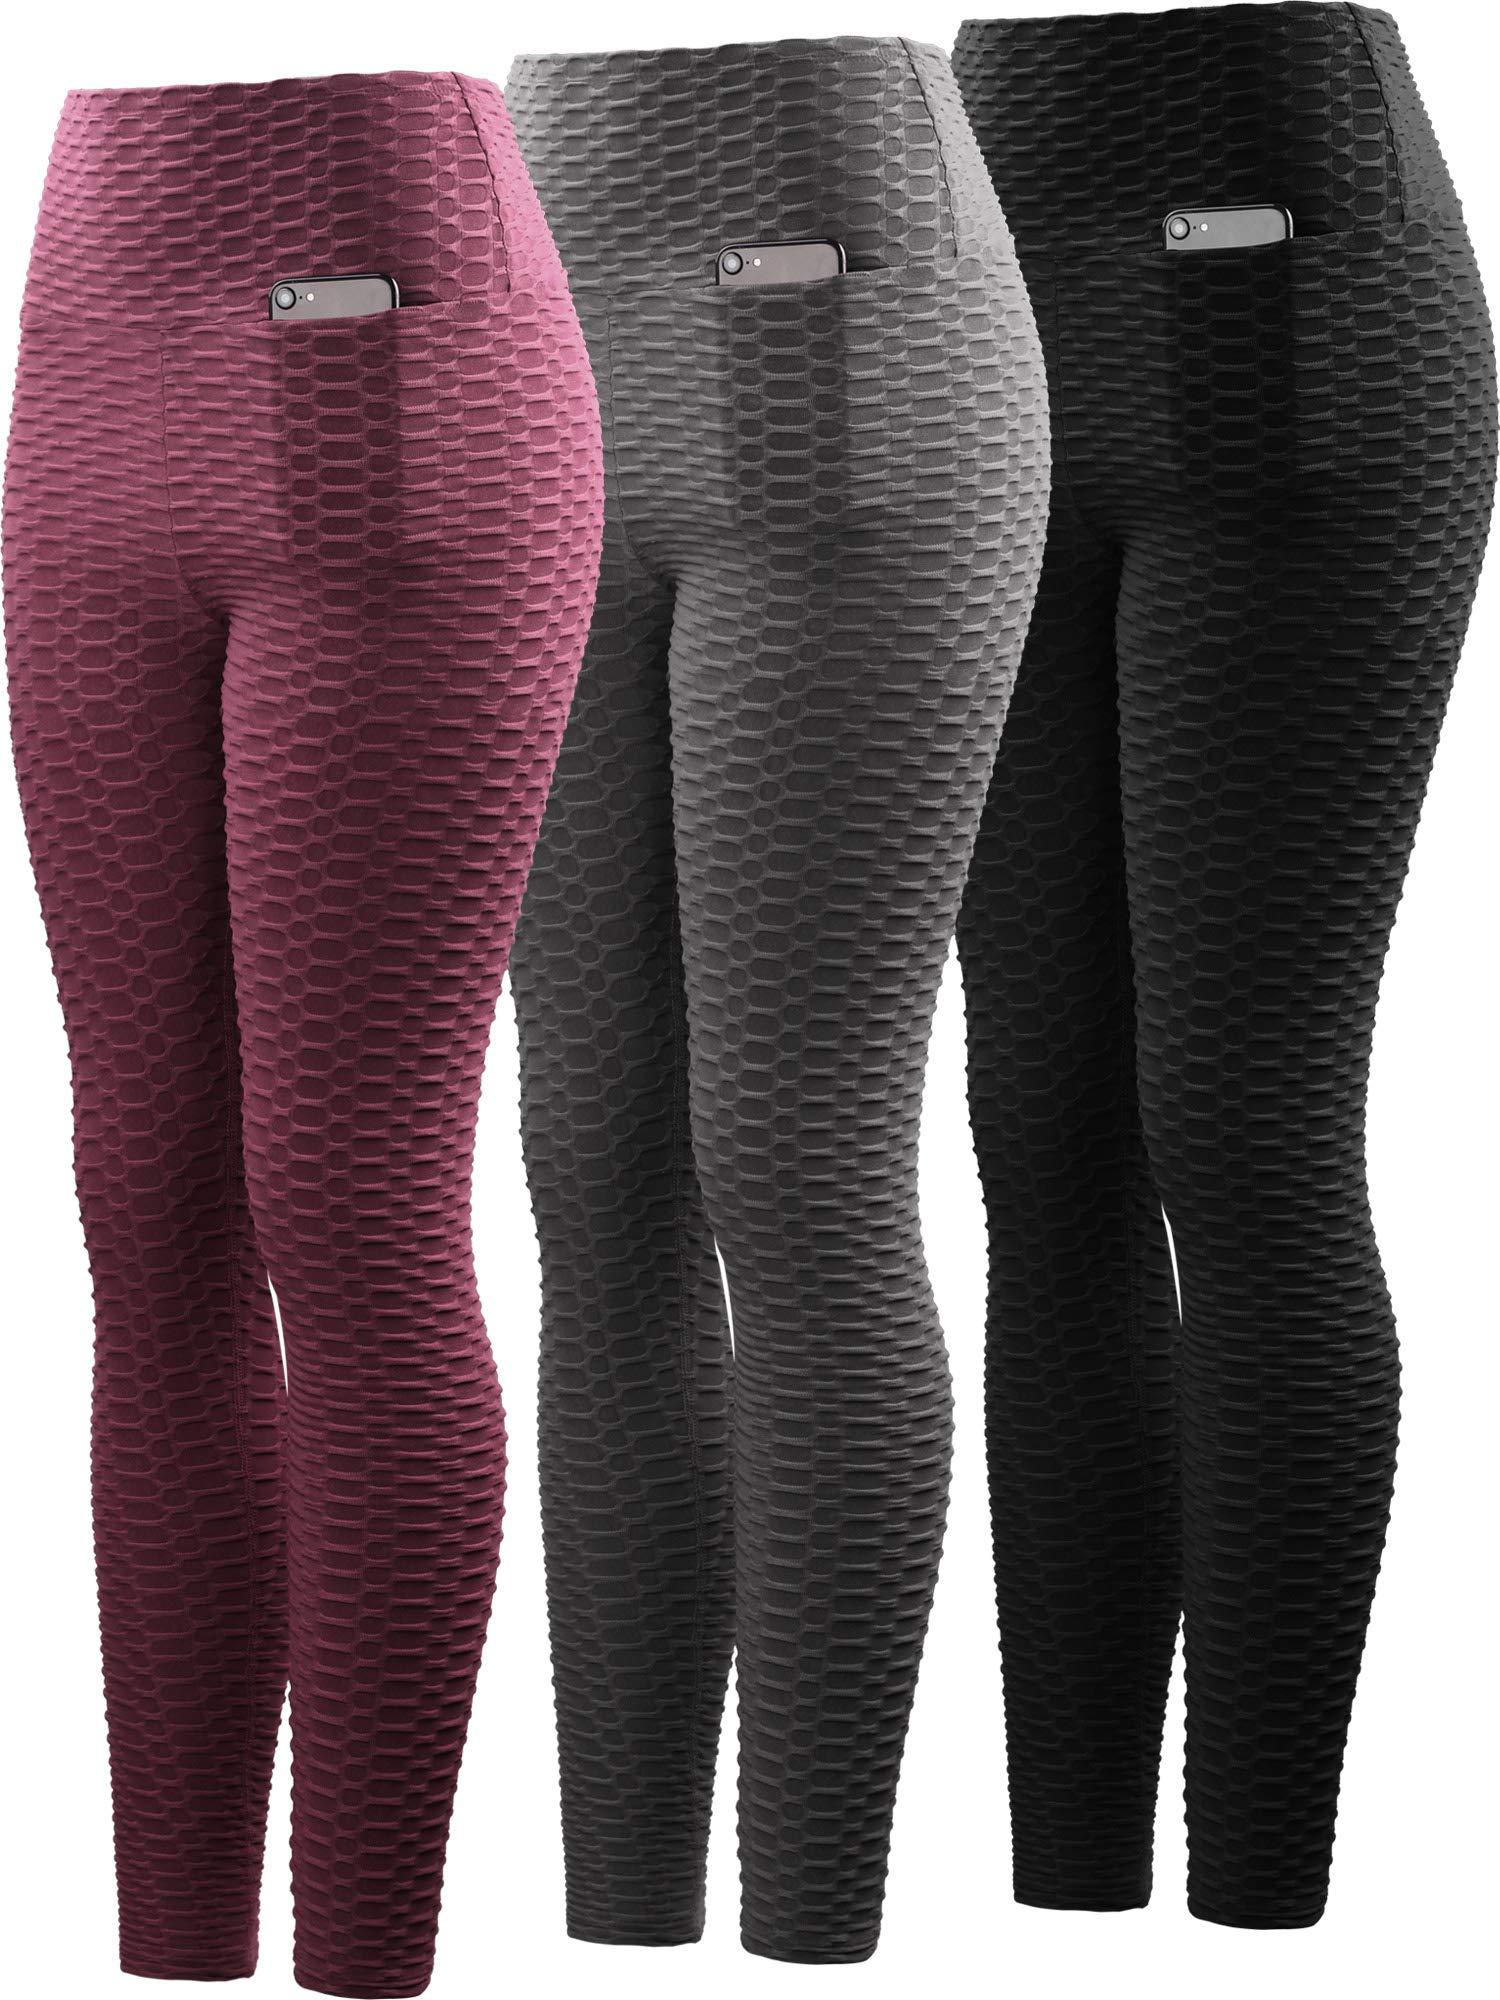 Neleus Women's 3 Pack Tummy Control High Waist Leggings Out Pocket,9036,Black/Grey/Maroon,S,EU M